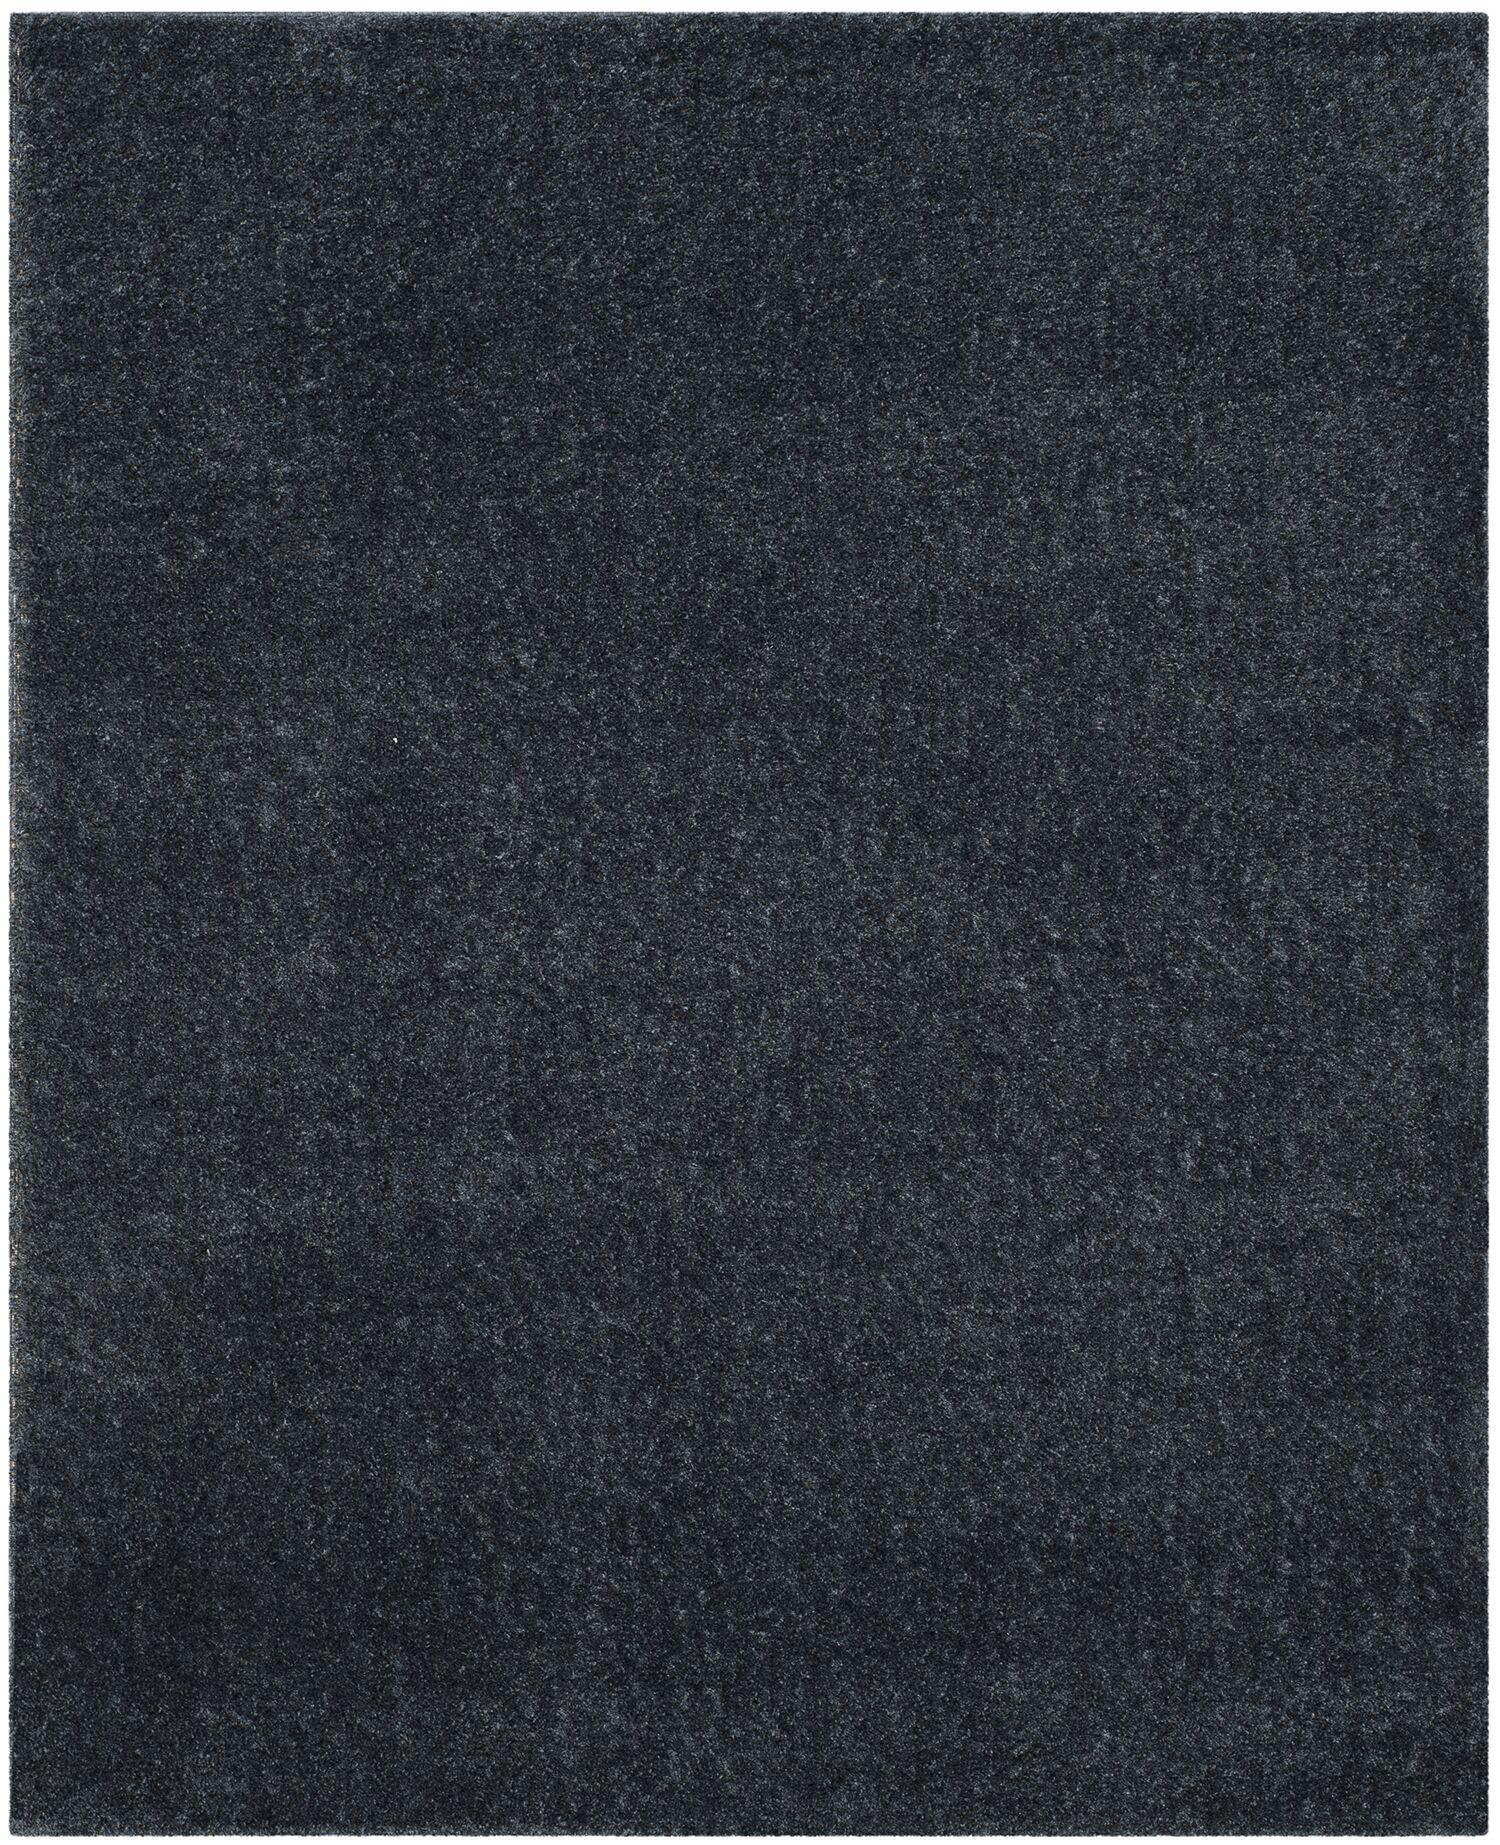 Curran Blue Area Rug Rug Size: Rectangle 9' x 12'